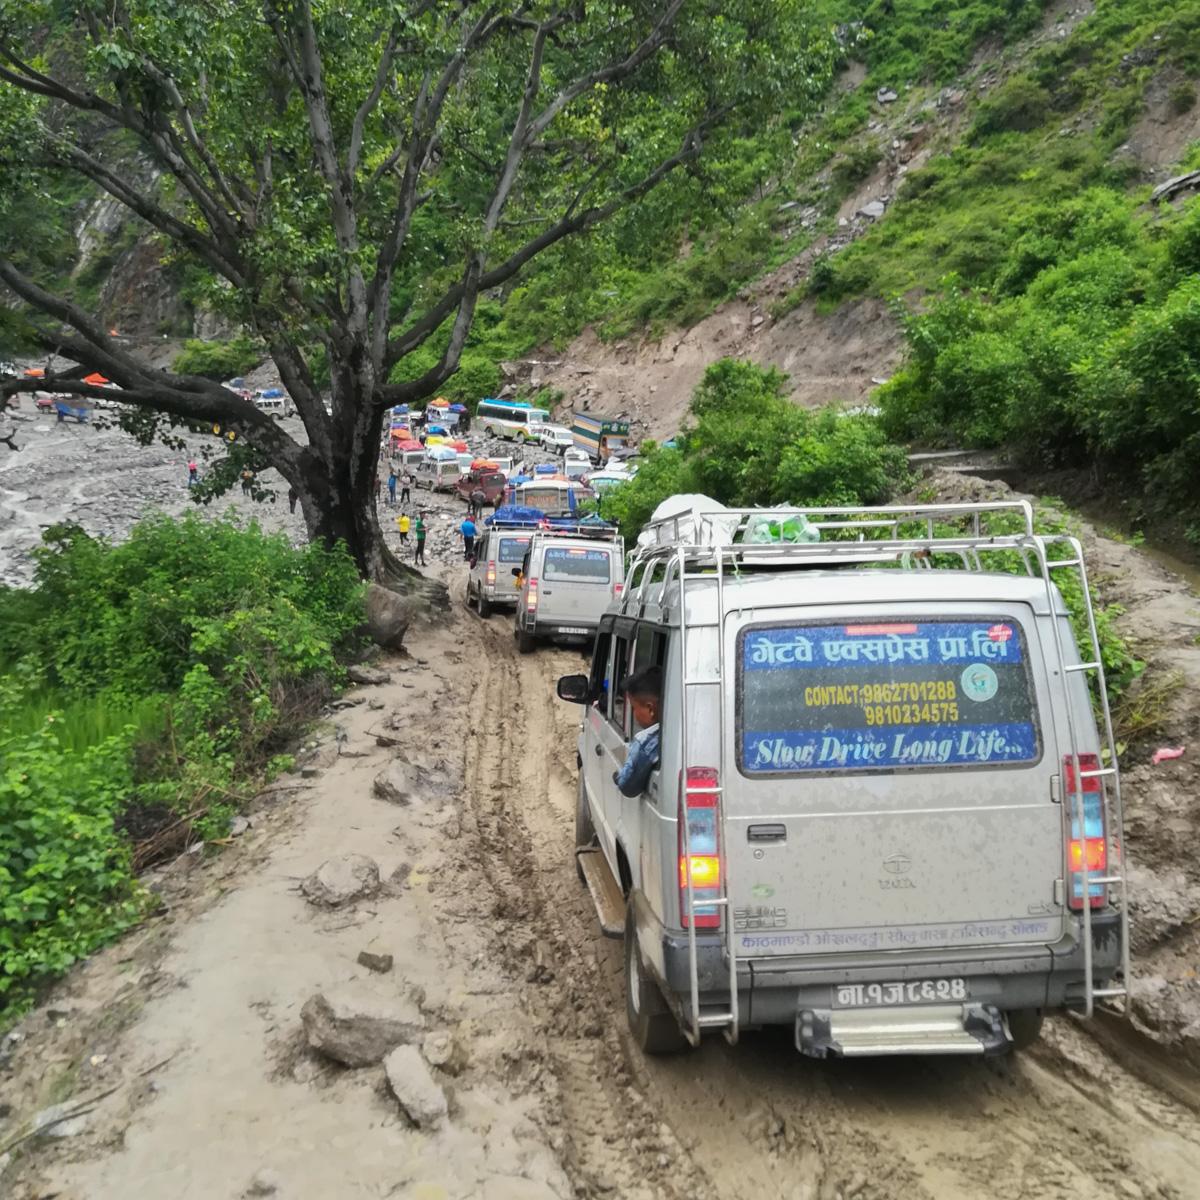 Back to Kathmandu, Everest 3 pass #4 29